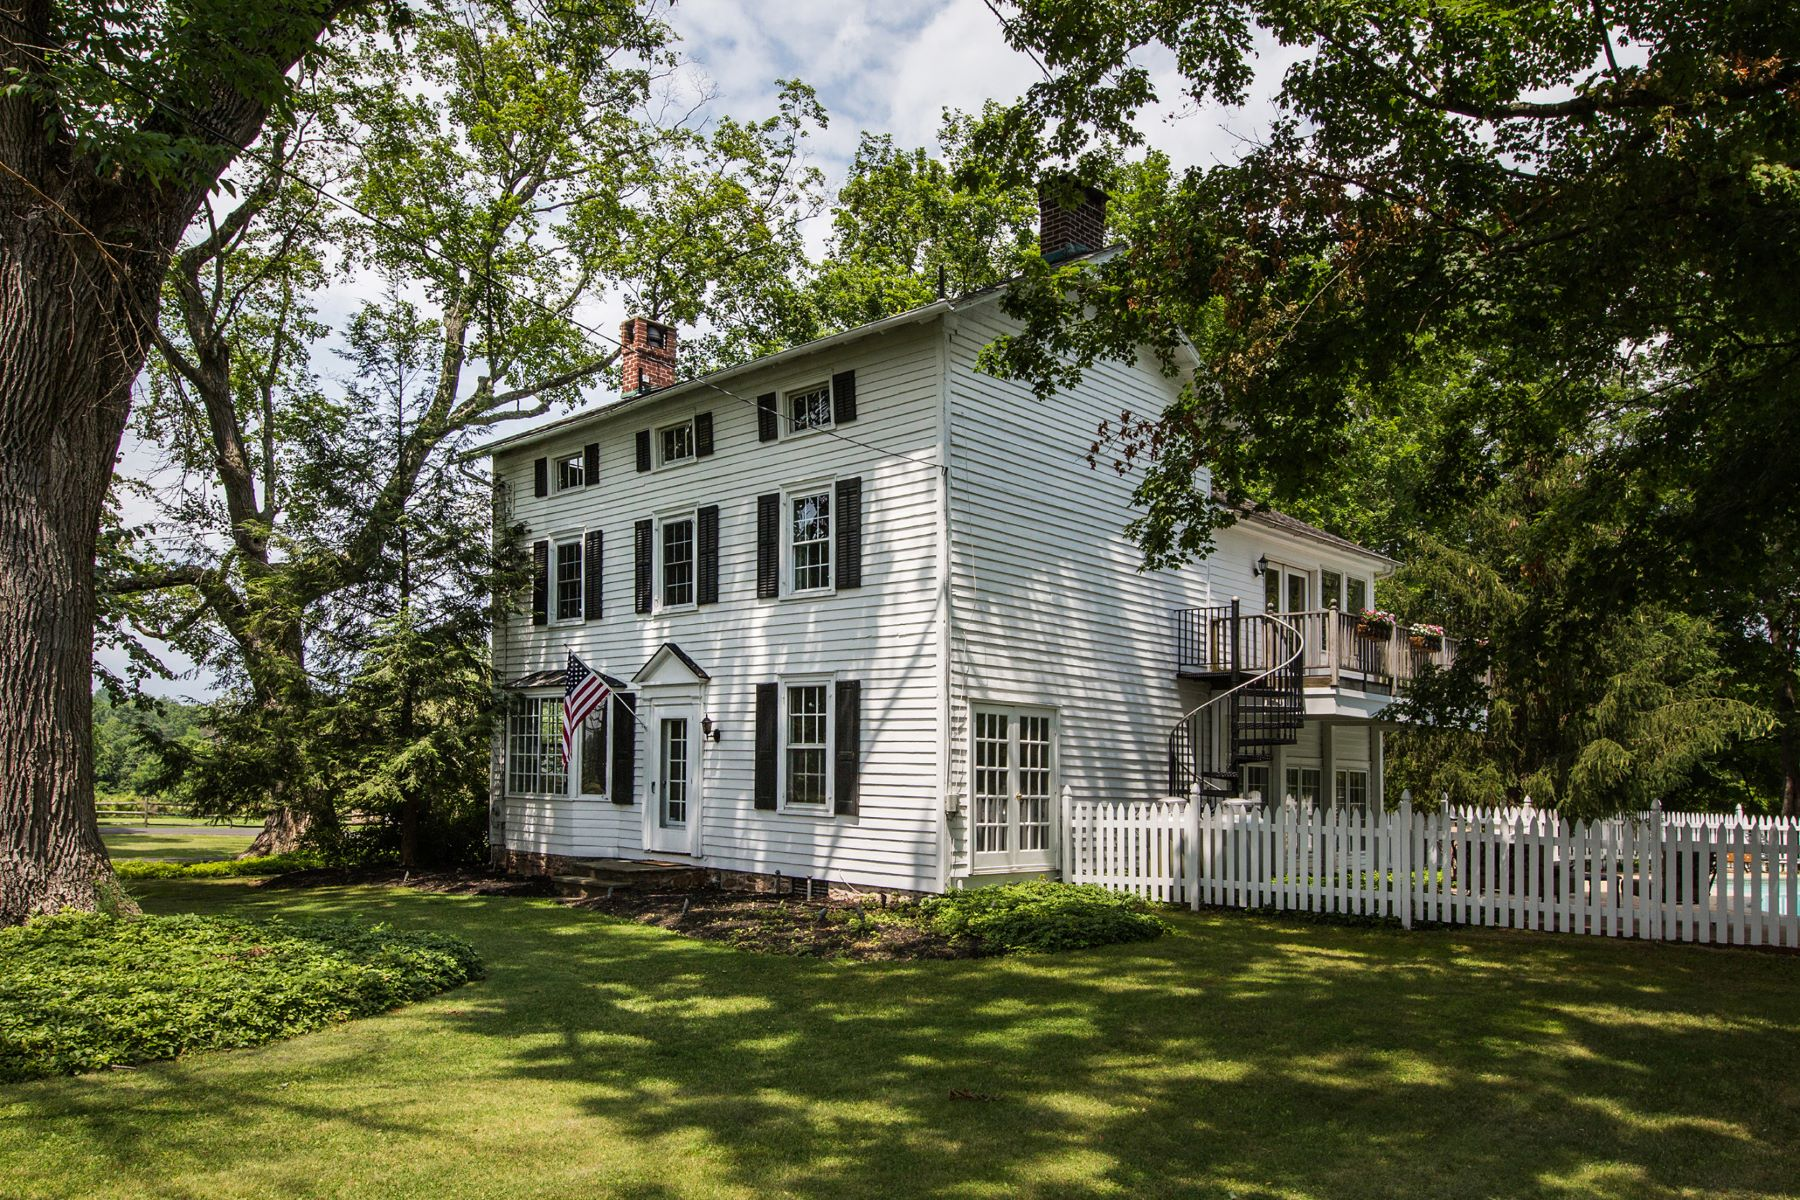 Single Family Home for Sale at Classic Farmhouse & Barn 293 LURGAN RD New Hope, Pennsylvania, 18938 United States